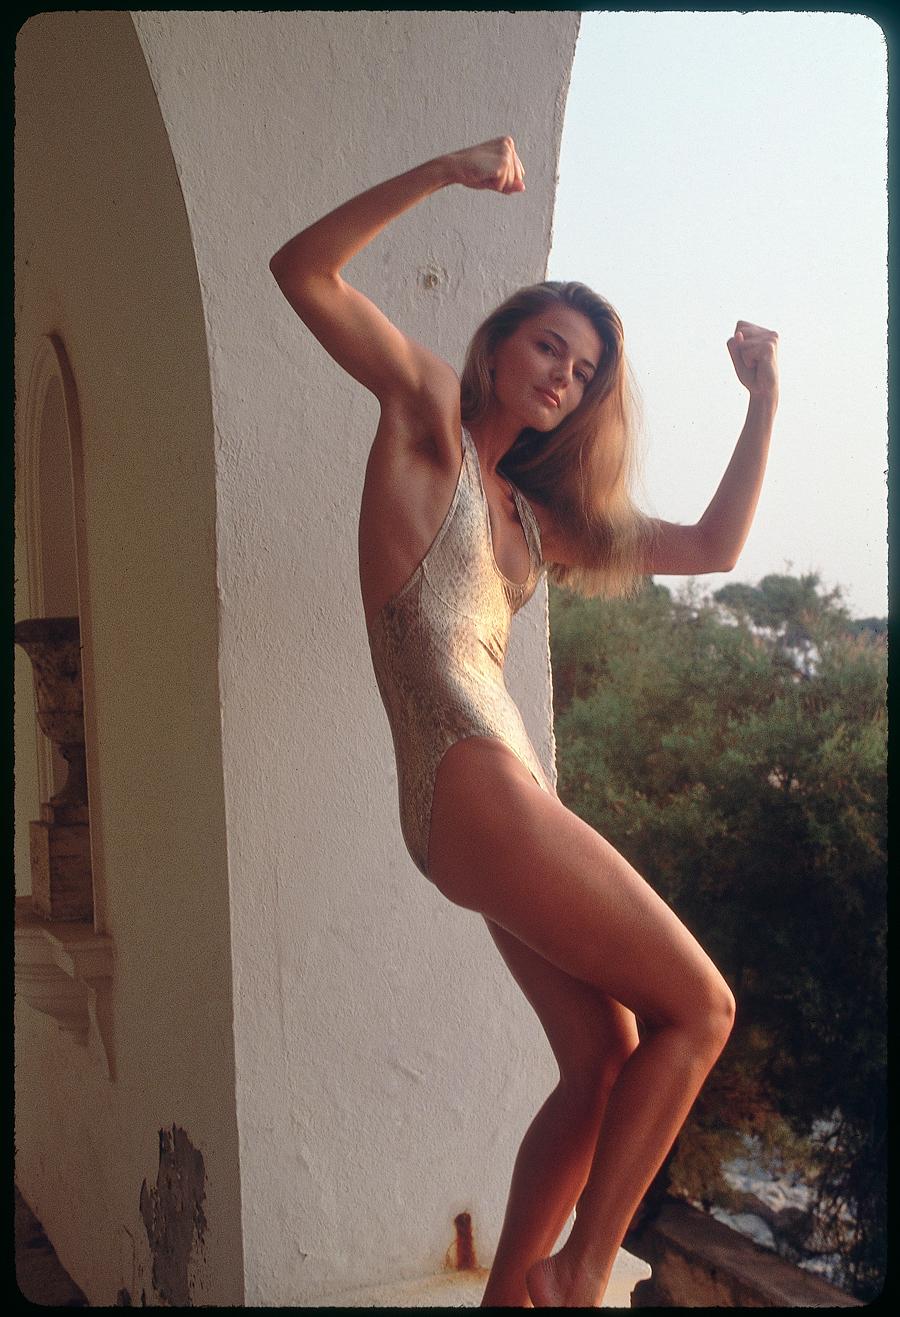 Paulina porizkova topless think